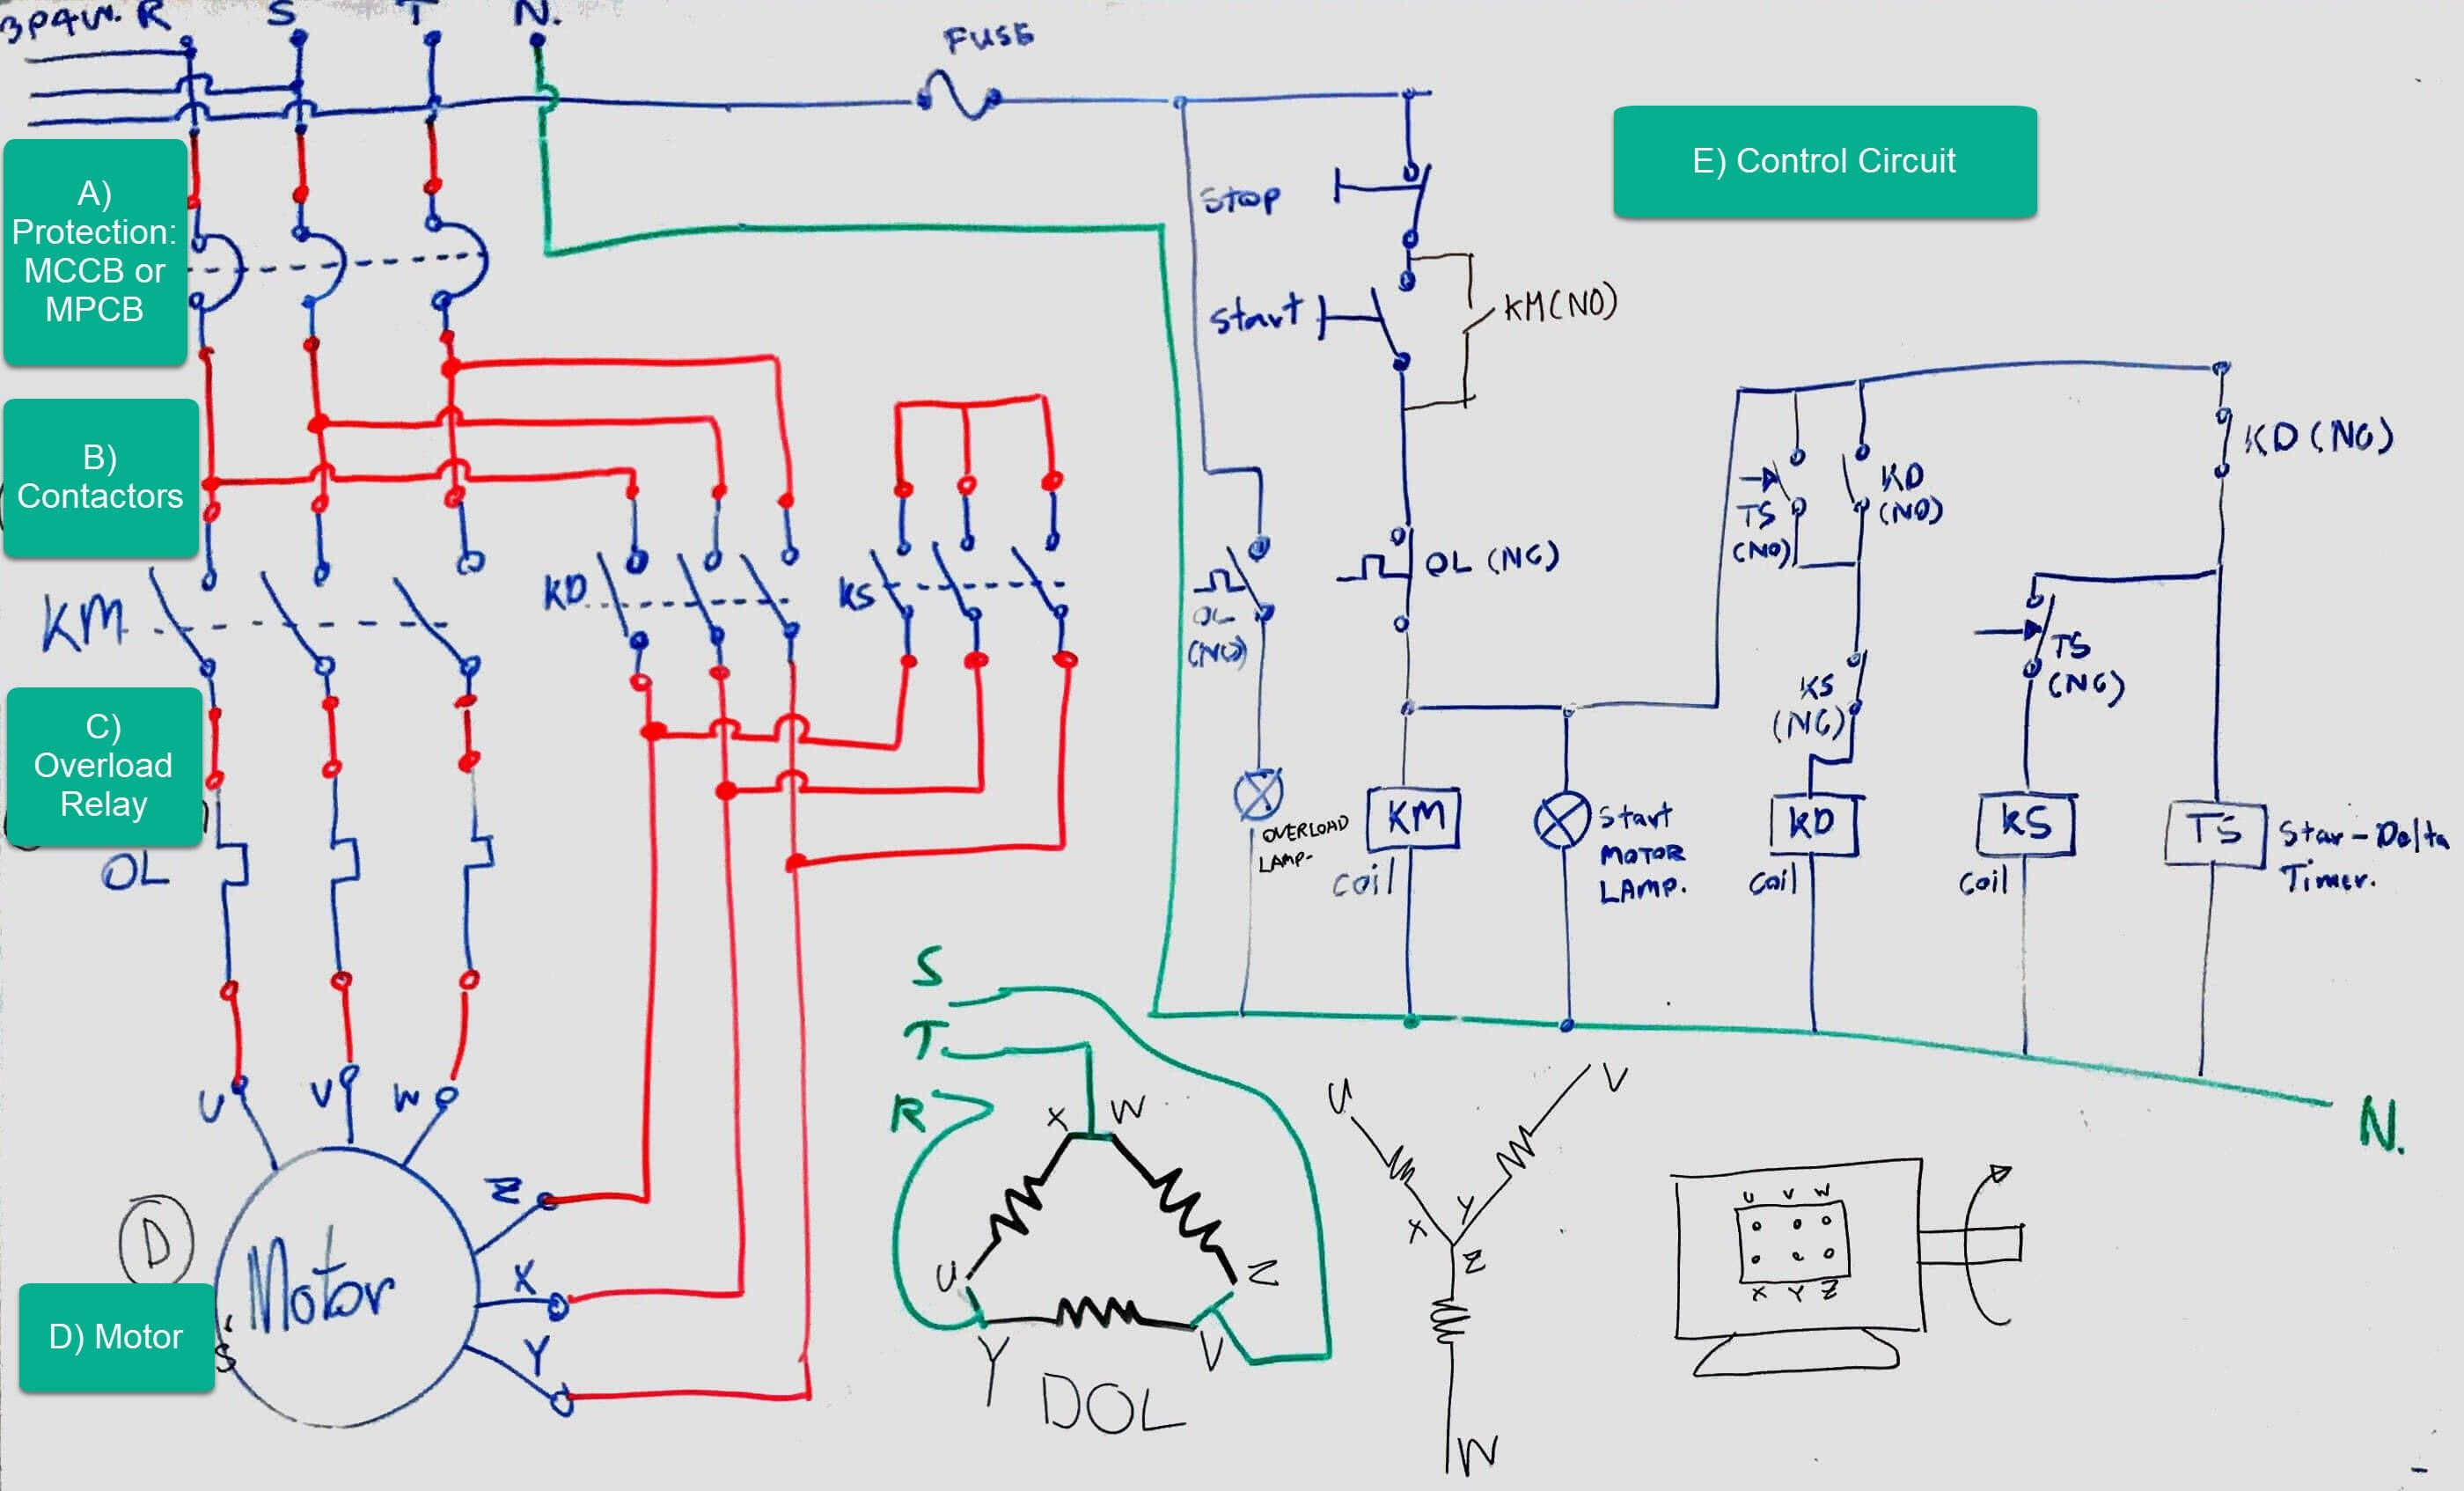 Contactor Wiring Diagram With Timer Diagram Diagramtemplate Diagramsample Electrical Circuit Diagram Diagram Circuit Diagram